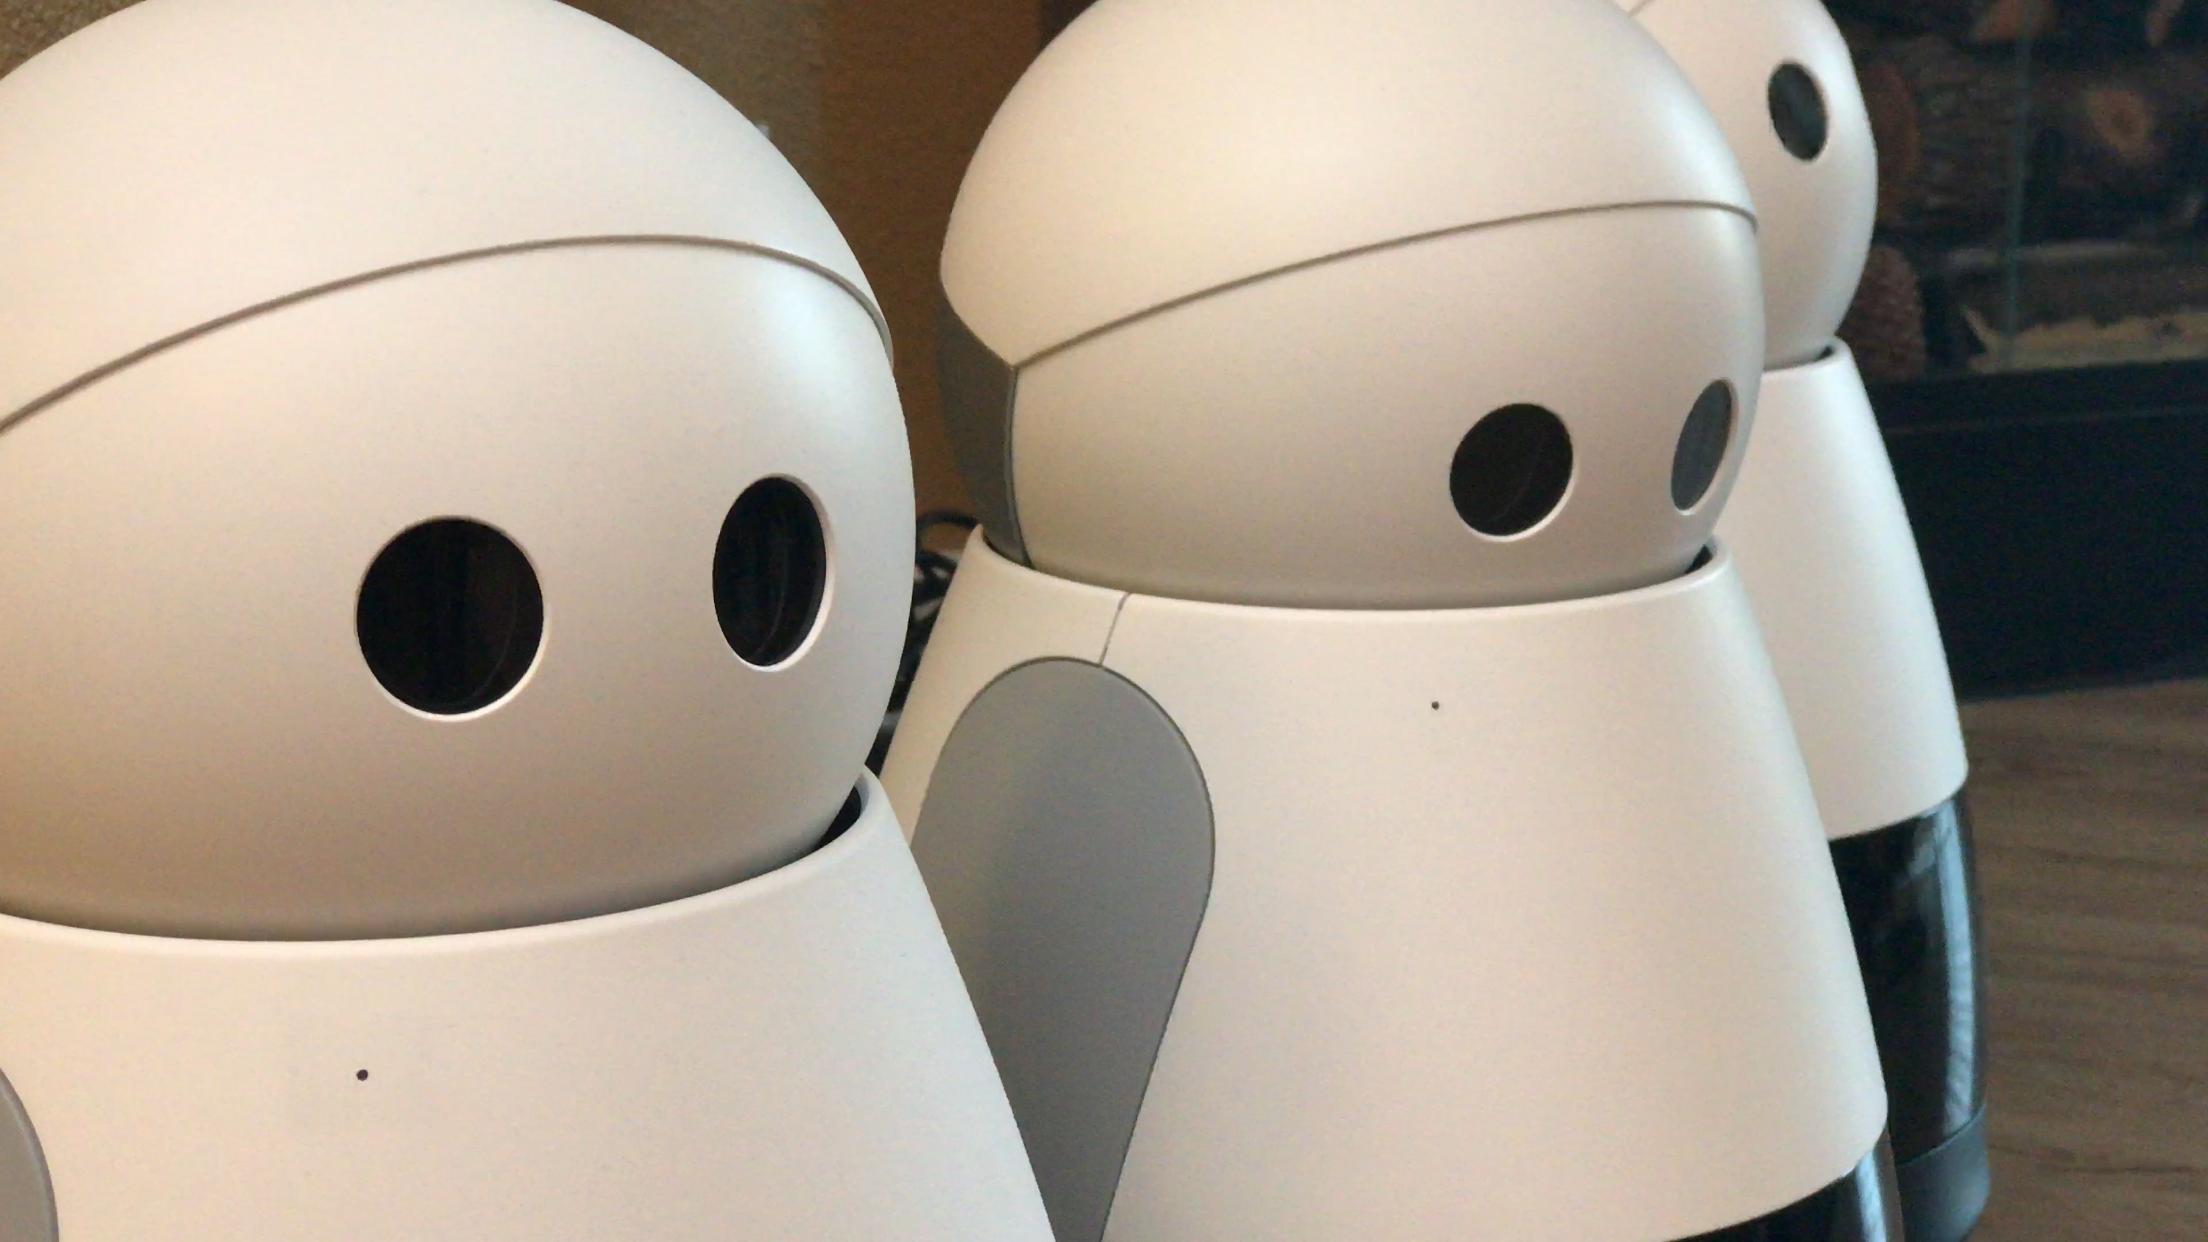 Kuri Mayfield Robotics